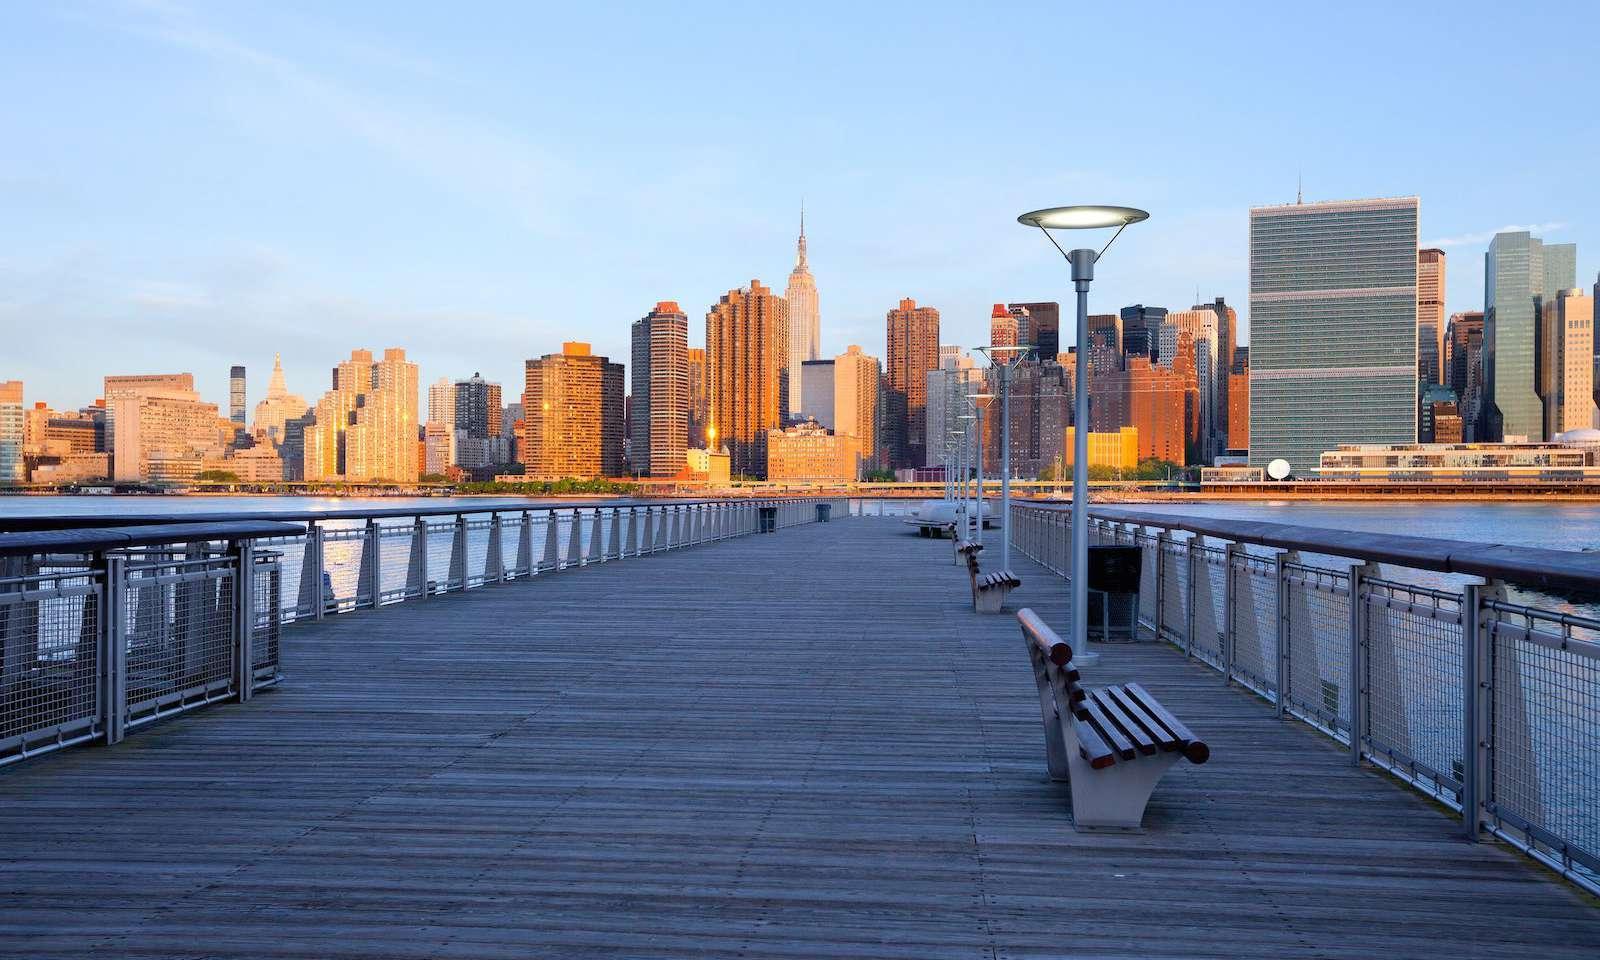 Gantry Plaza State Park: amor en nueva york